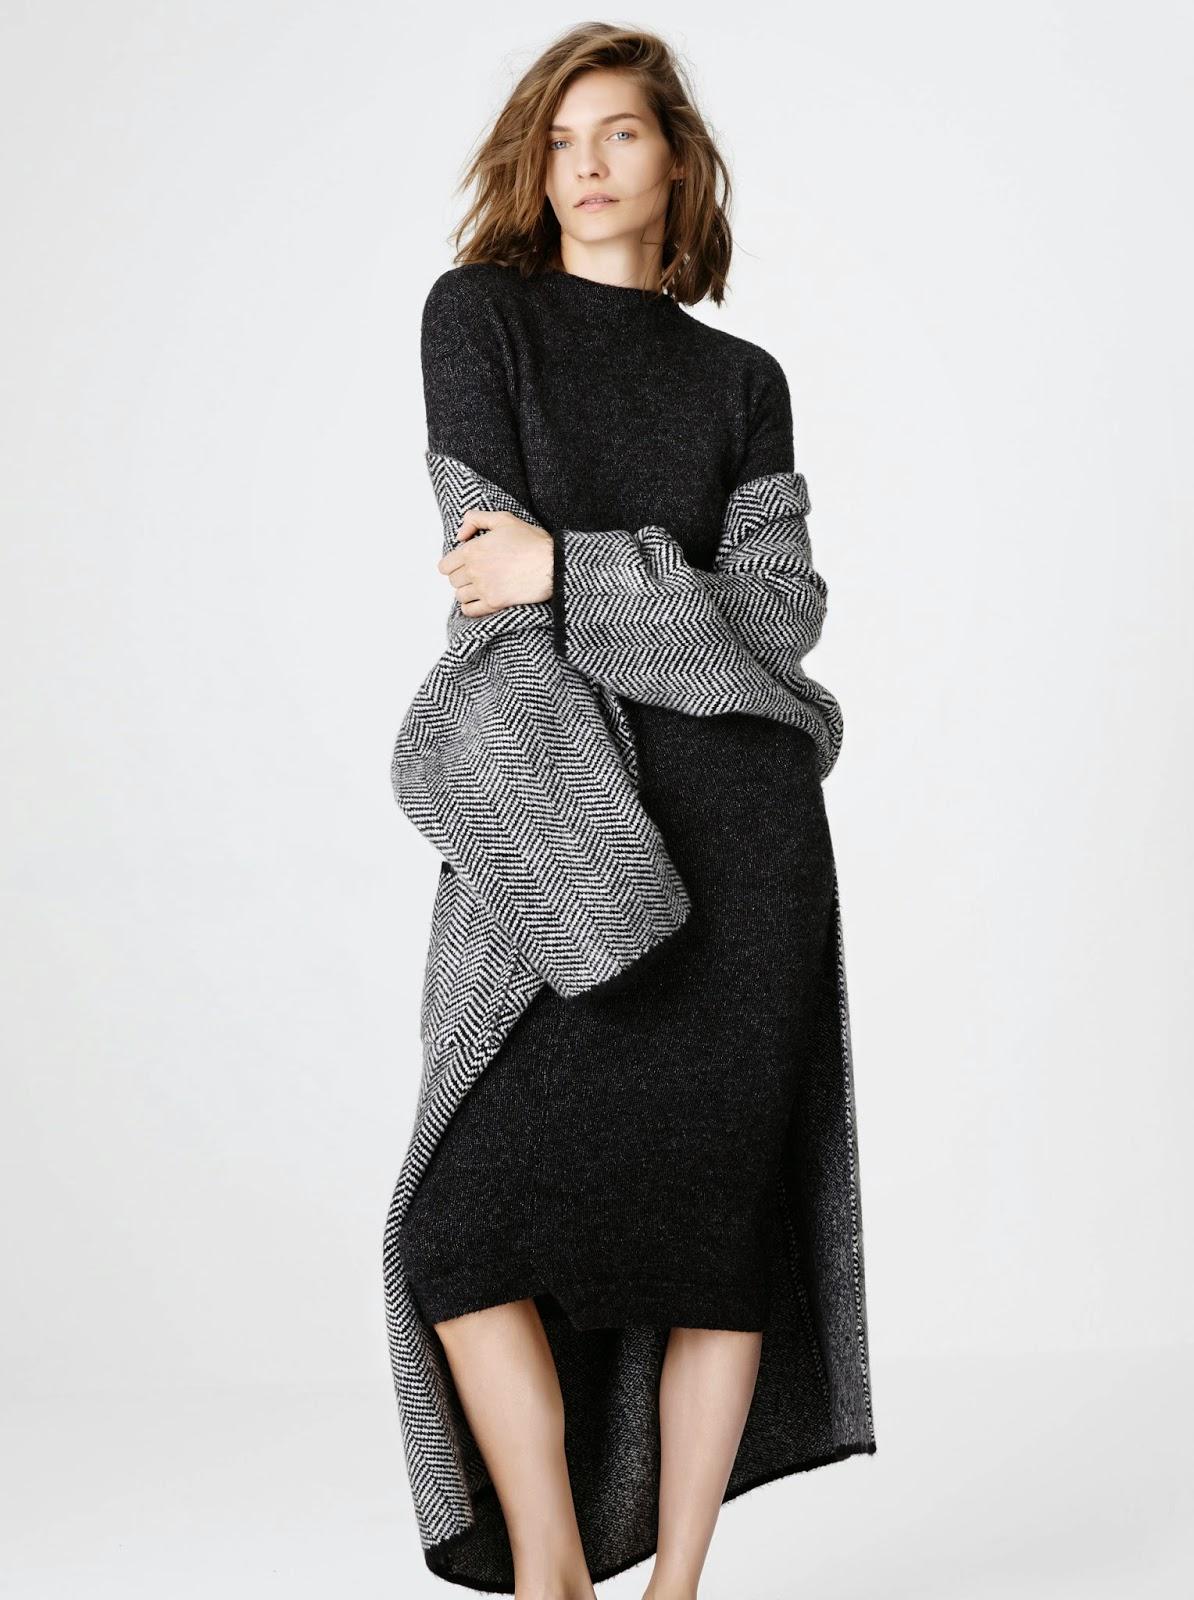 Zara November Lookbook Moda Fashion Trends Tendencias Otoño 2014